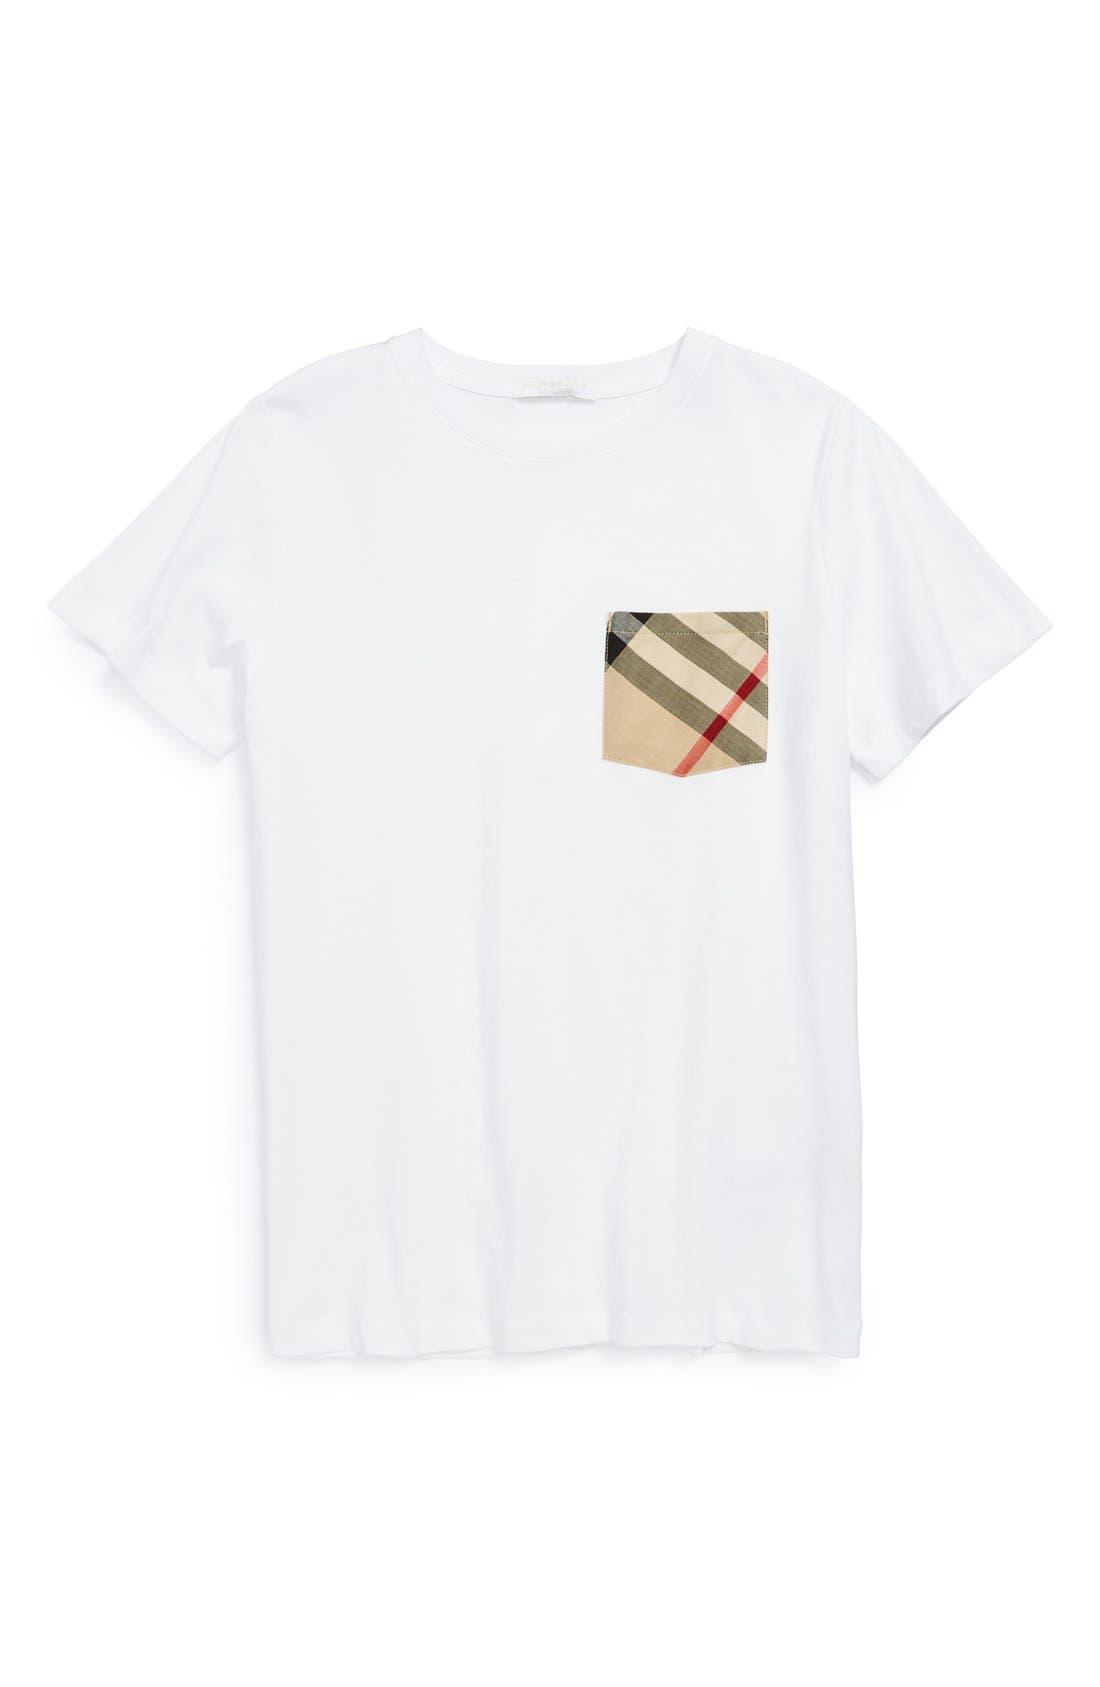 Boys Burberry Check Print Chest Pocket TShirt Size 8Y  White